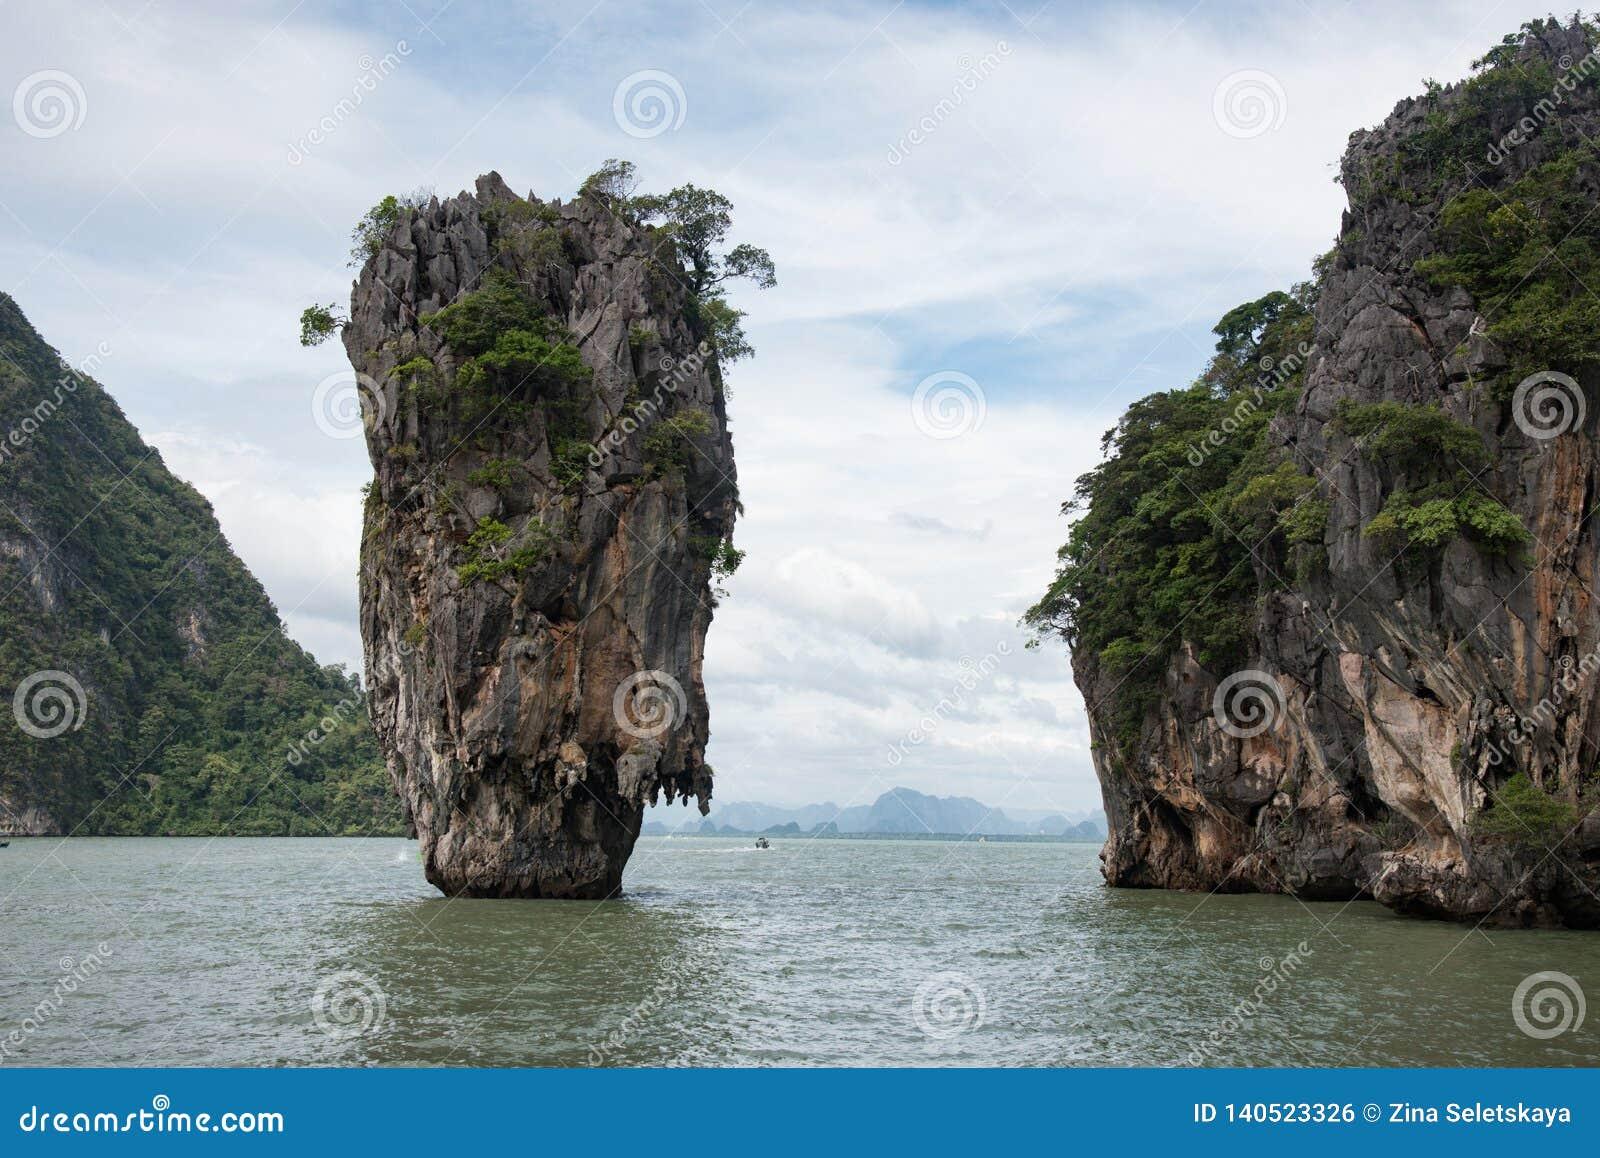 Famous James Bond Island Thailand Stock Photo Image Of